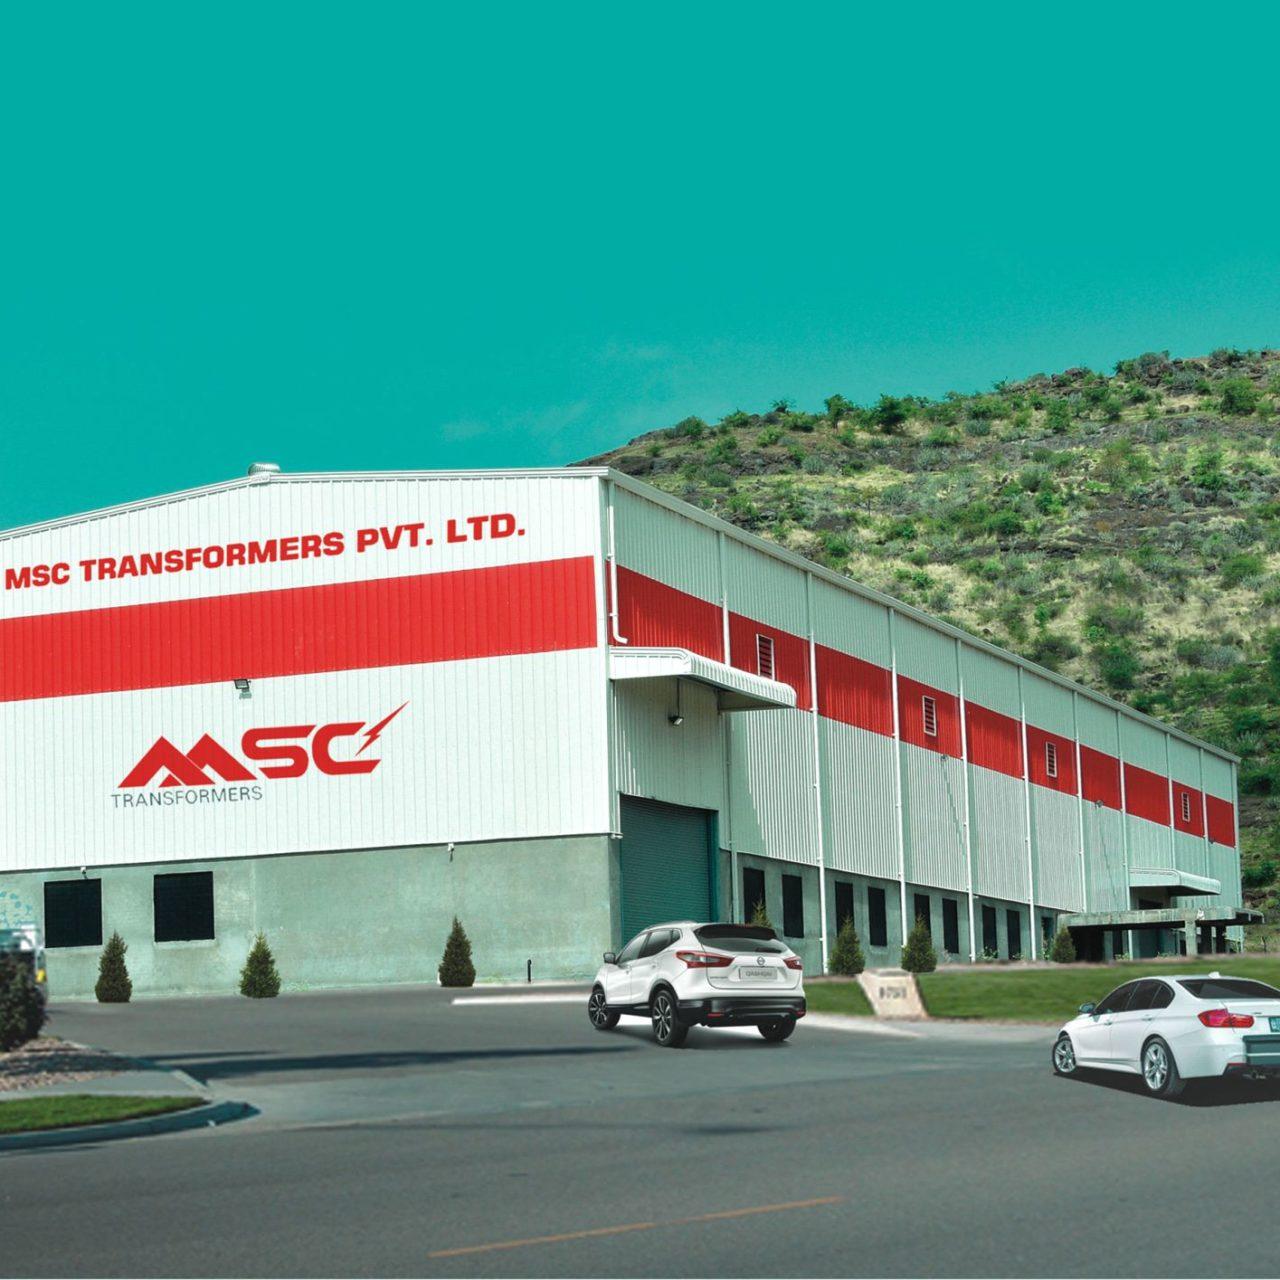 MSC Transformers Pvt Ltd - Factory